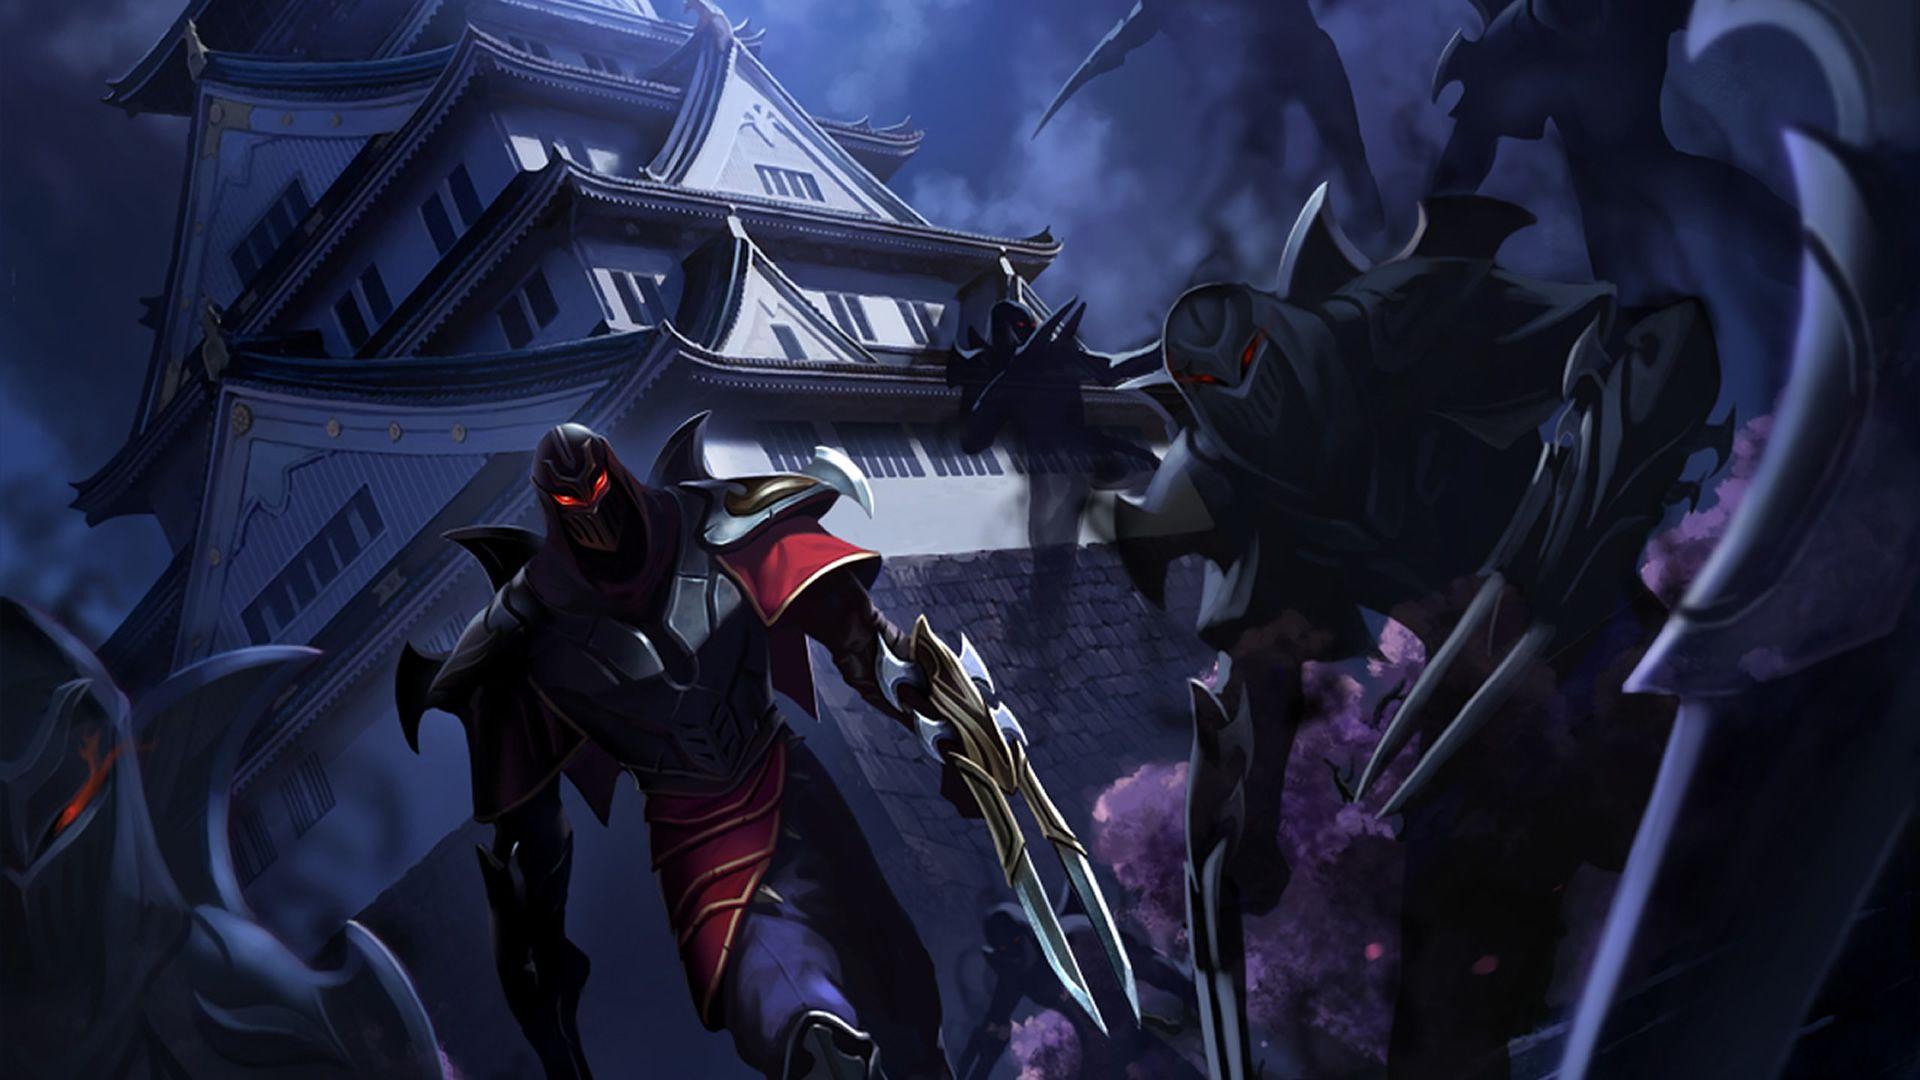 League Of Legends HD Wallpapers Backgrounds Wallpaper HD